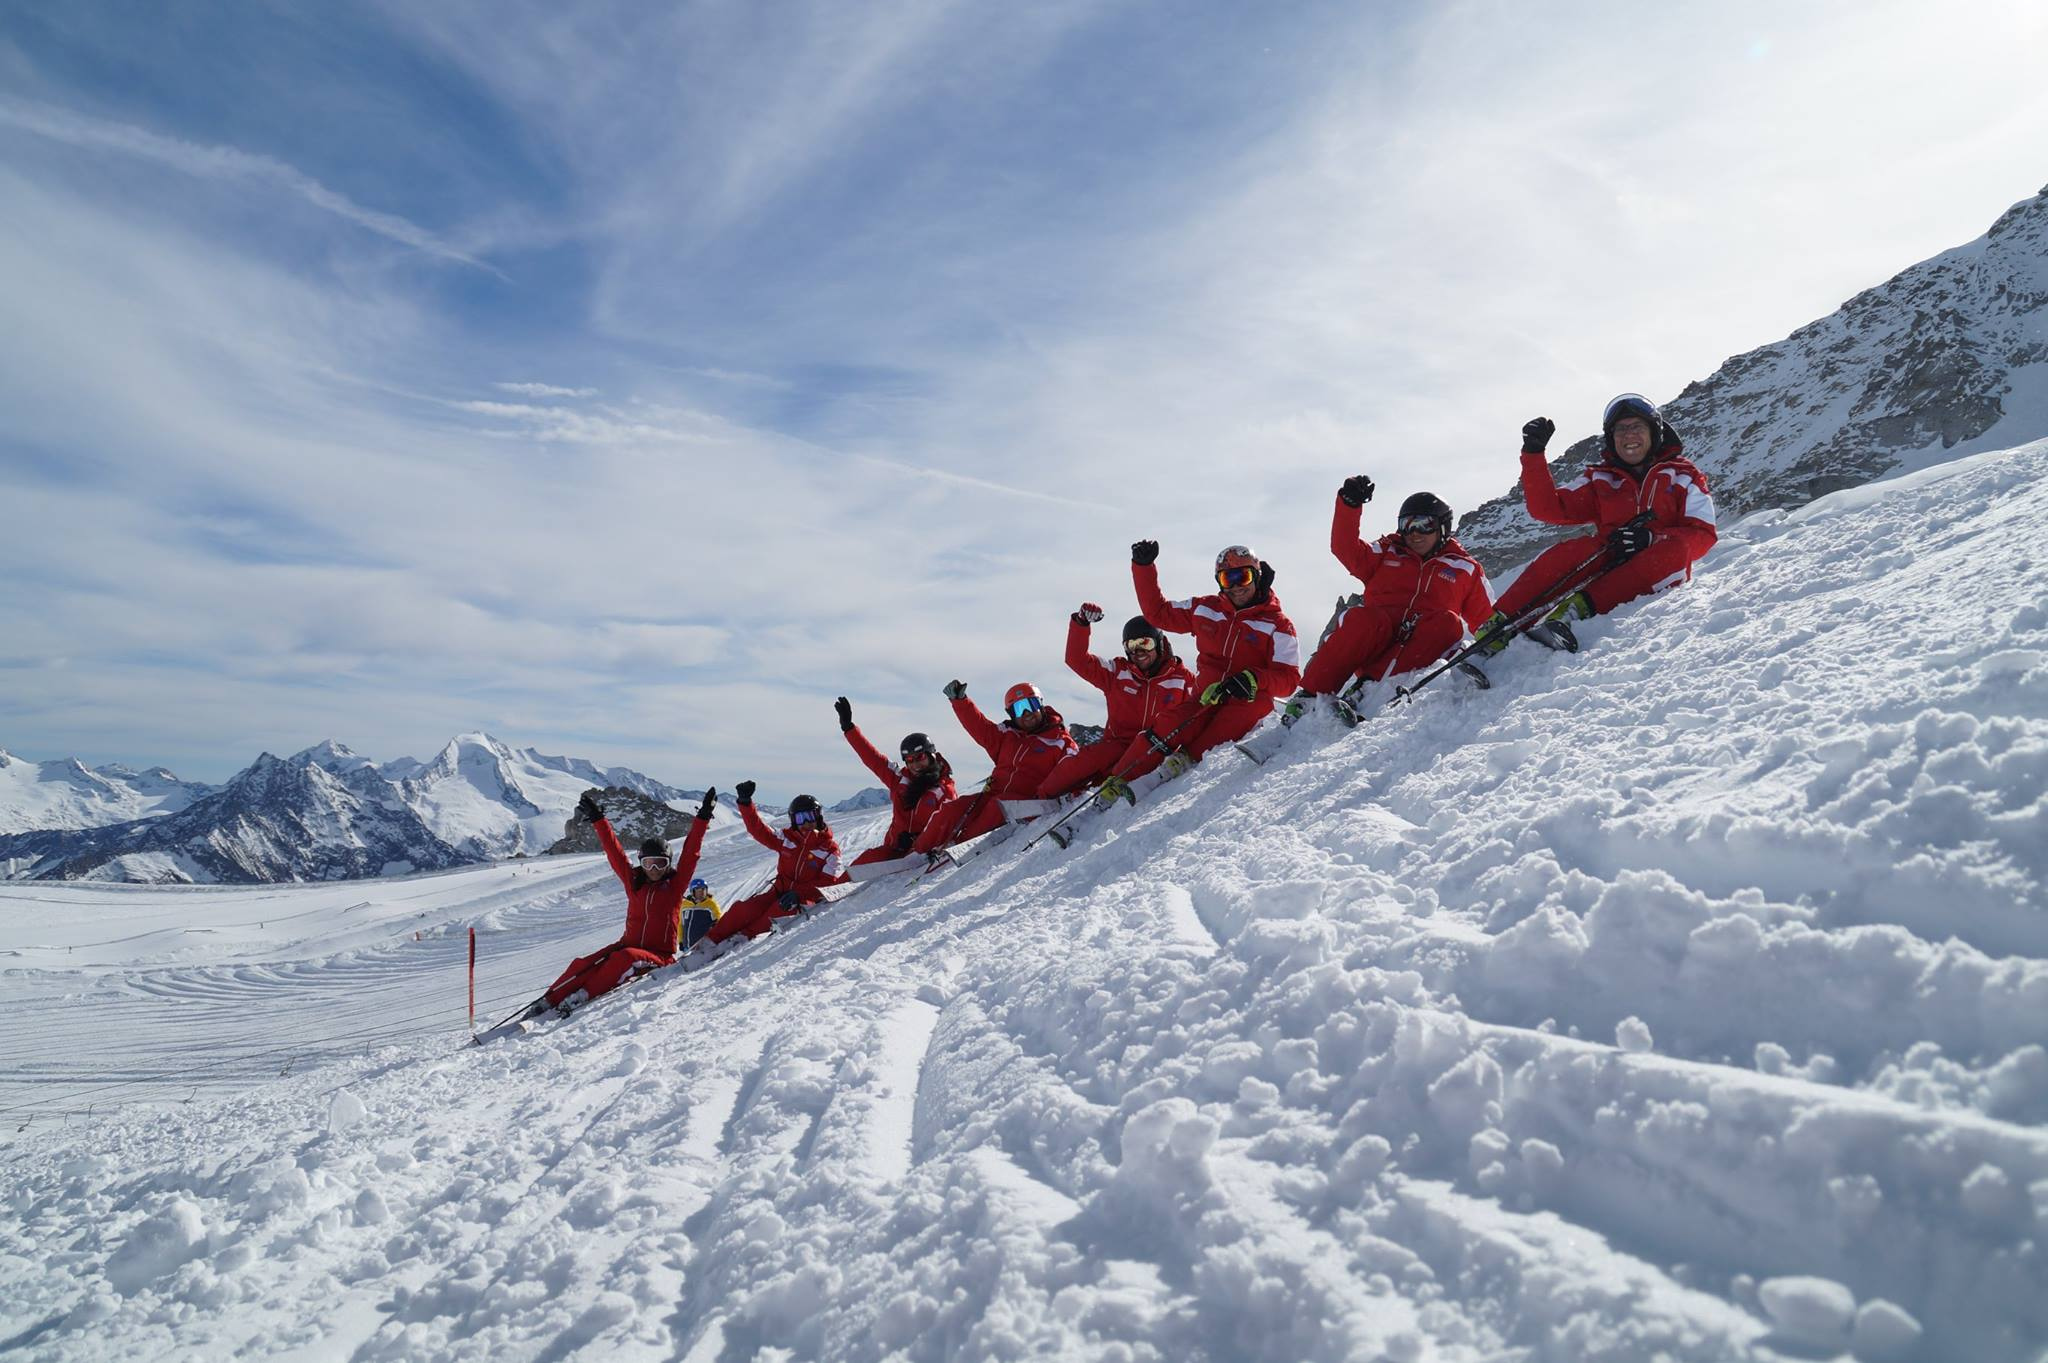 Wintersportschule Gerlos, SKipodium